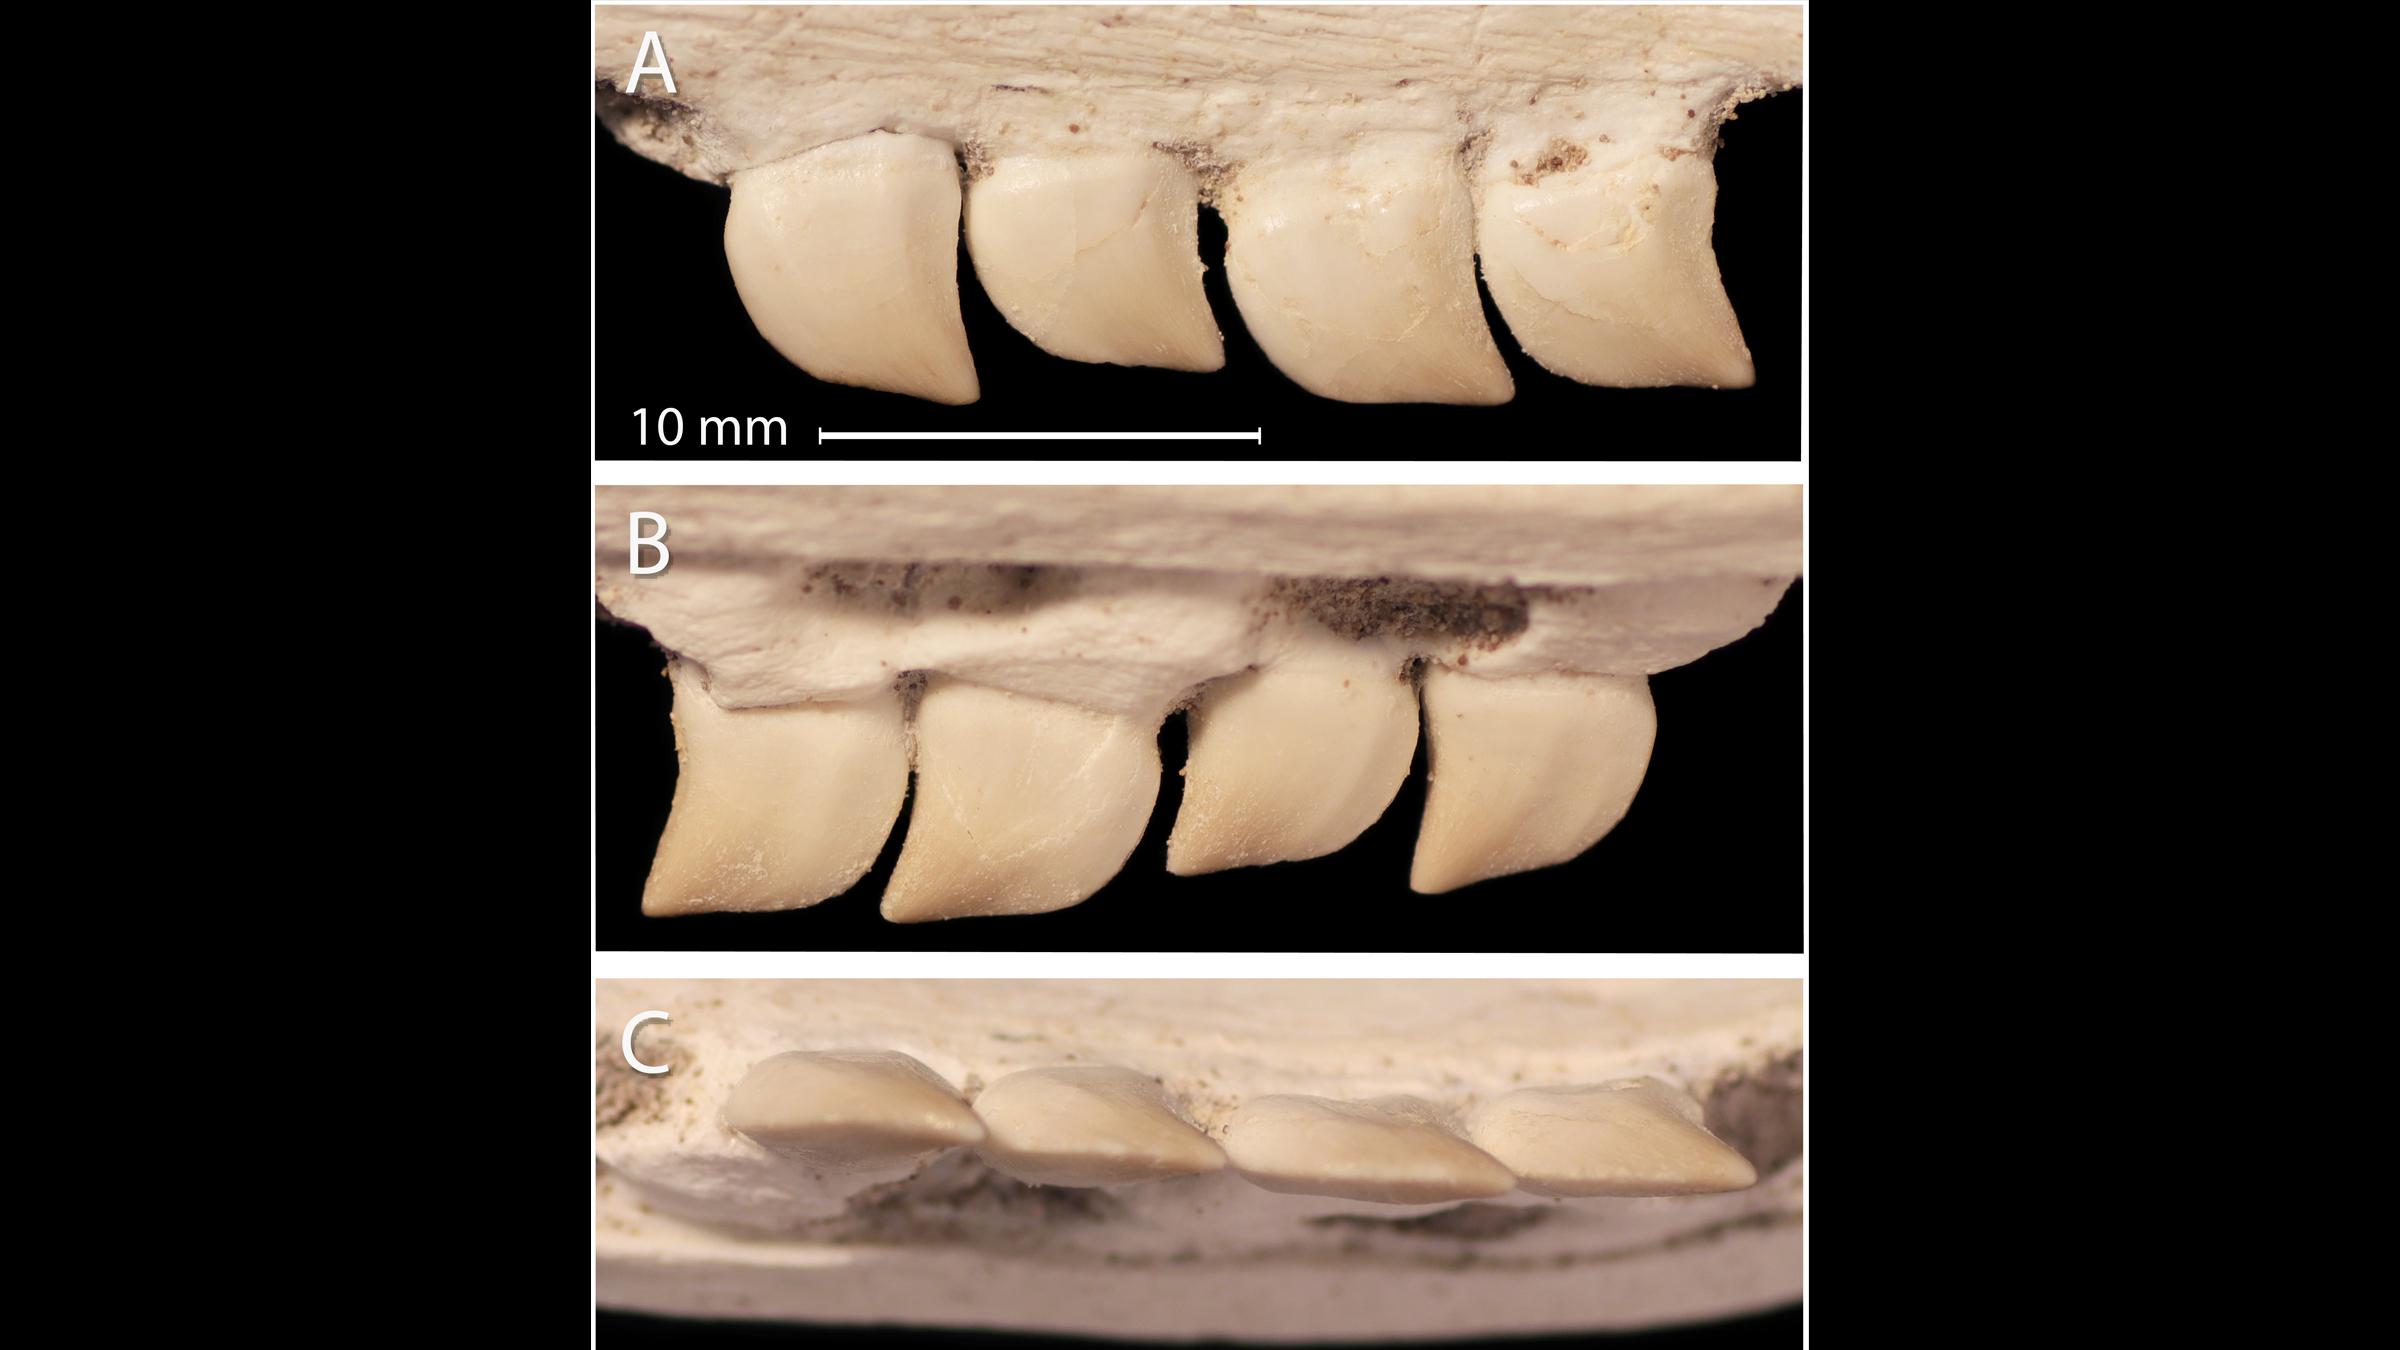 A close-up view of Xenodens' teeth